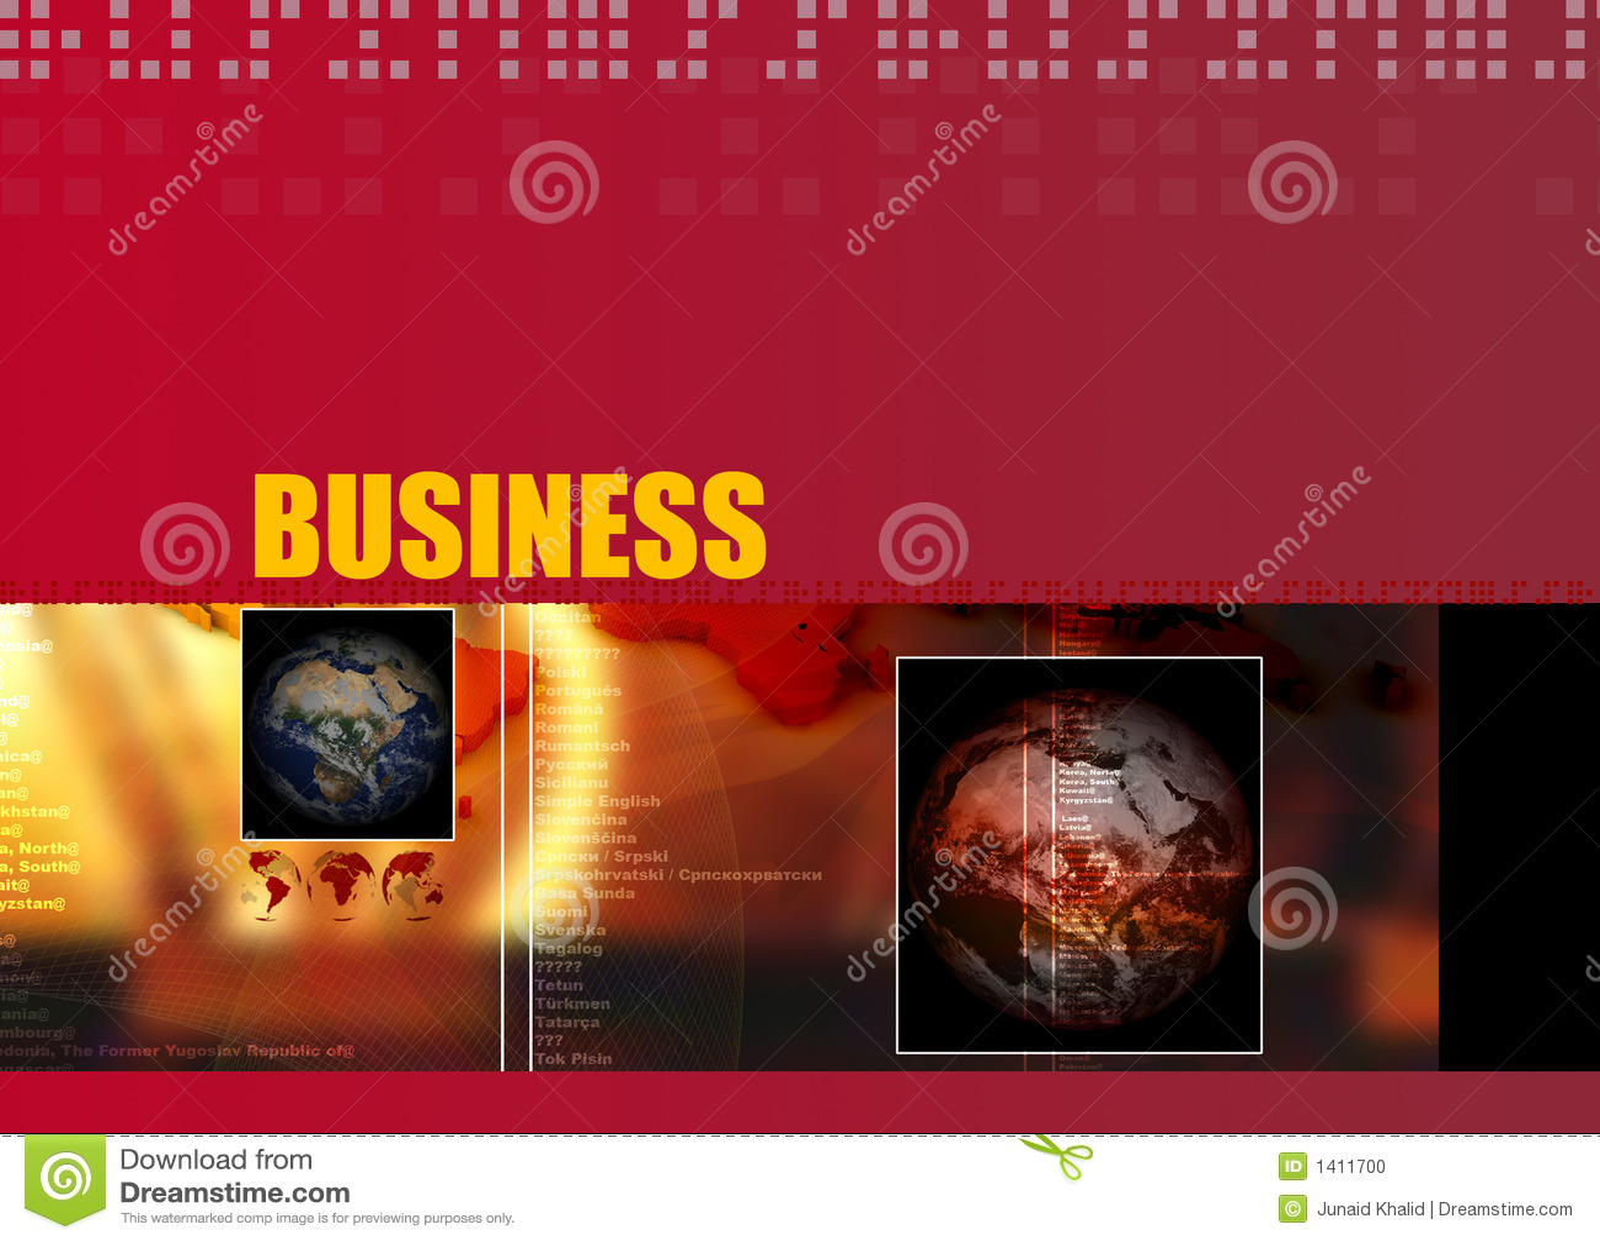 Business theme 004